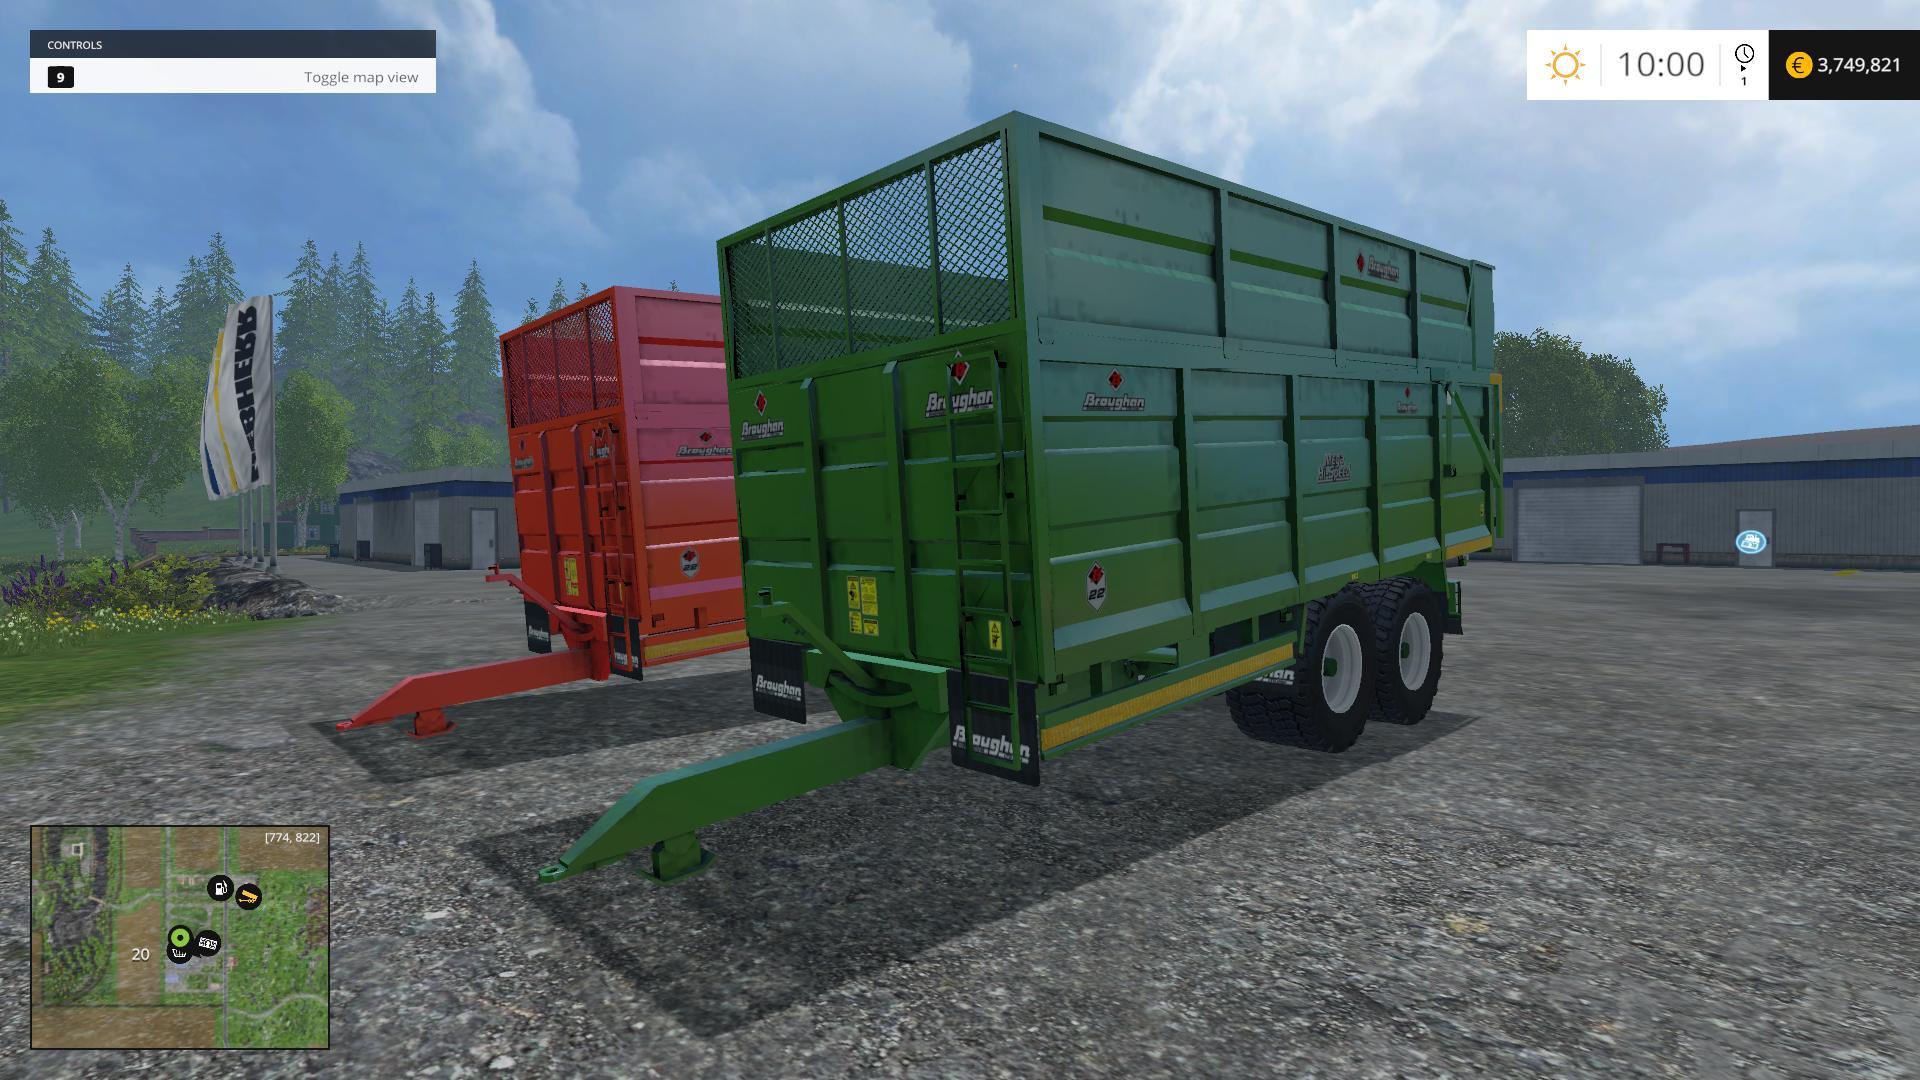 BROUGHAN SILAGE TRAILER V1 • Farming simulator 19, 17, 15 mods